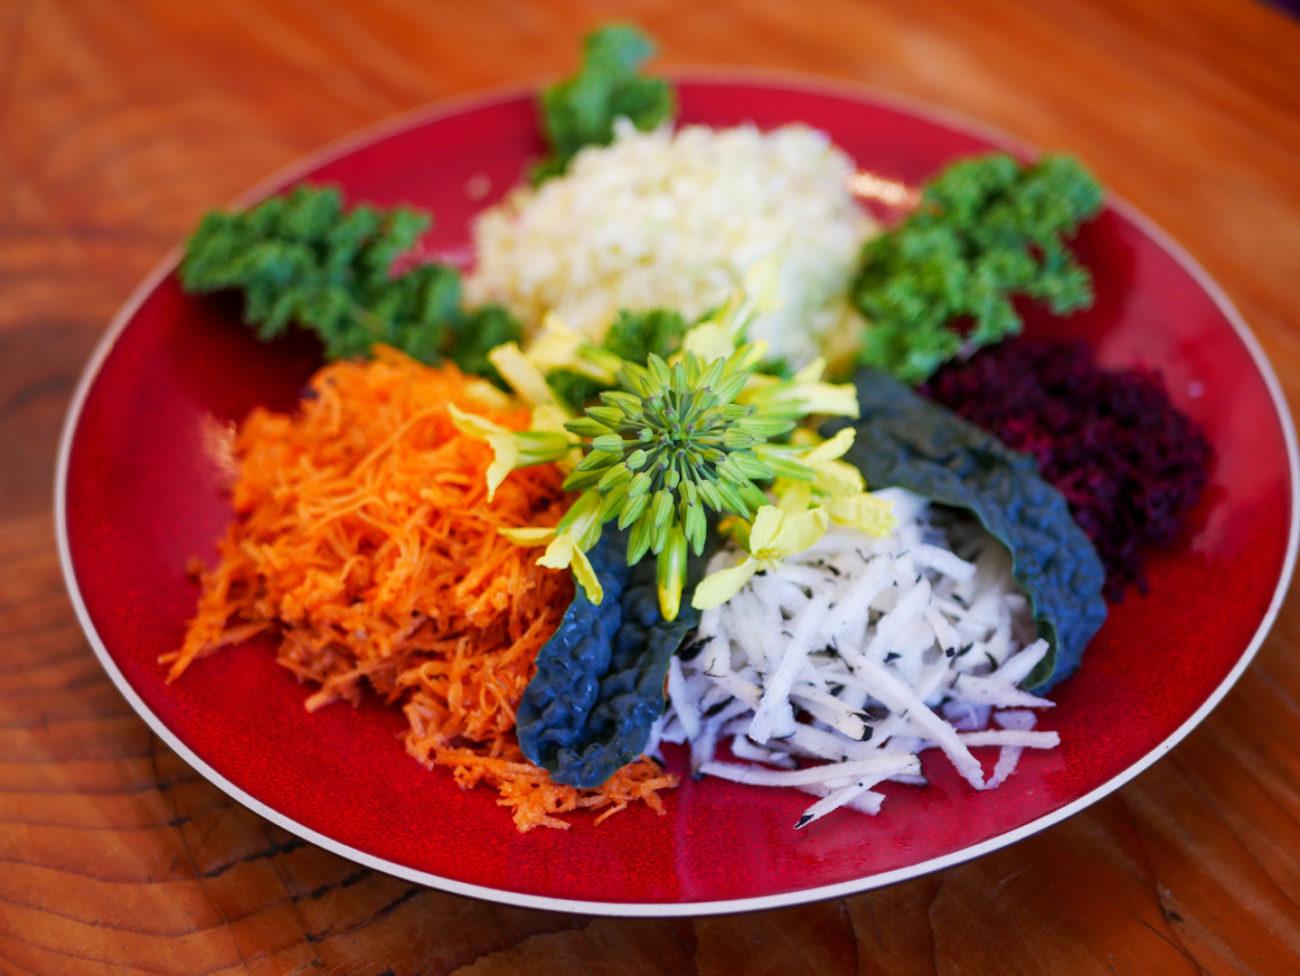 Salade Carotte – Radis noir – Chou Blanc – Betterave